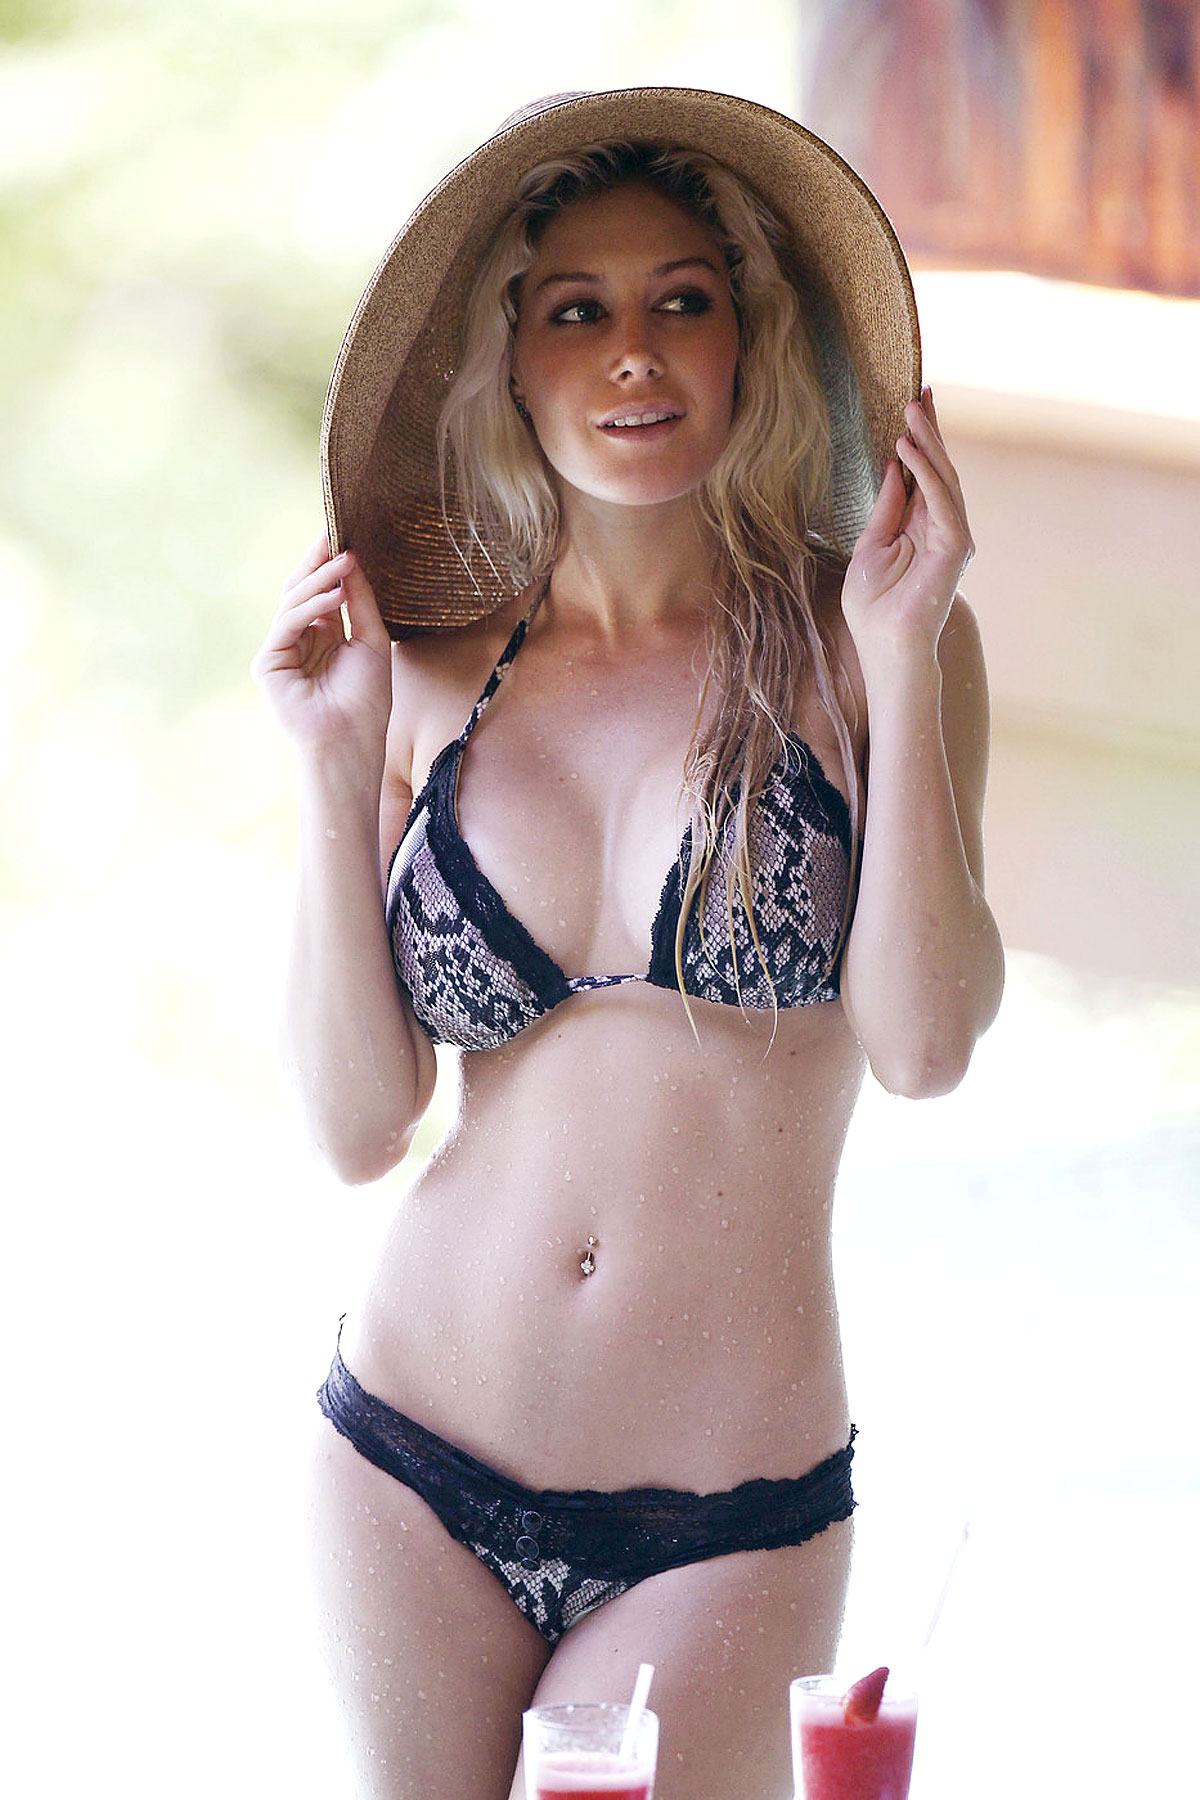 Heidi Montag and Her Bikini Body in Costa Rica (PHOTOS)